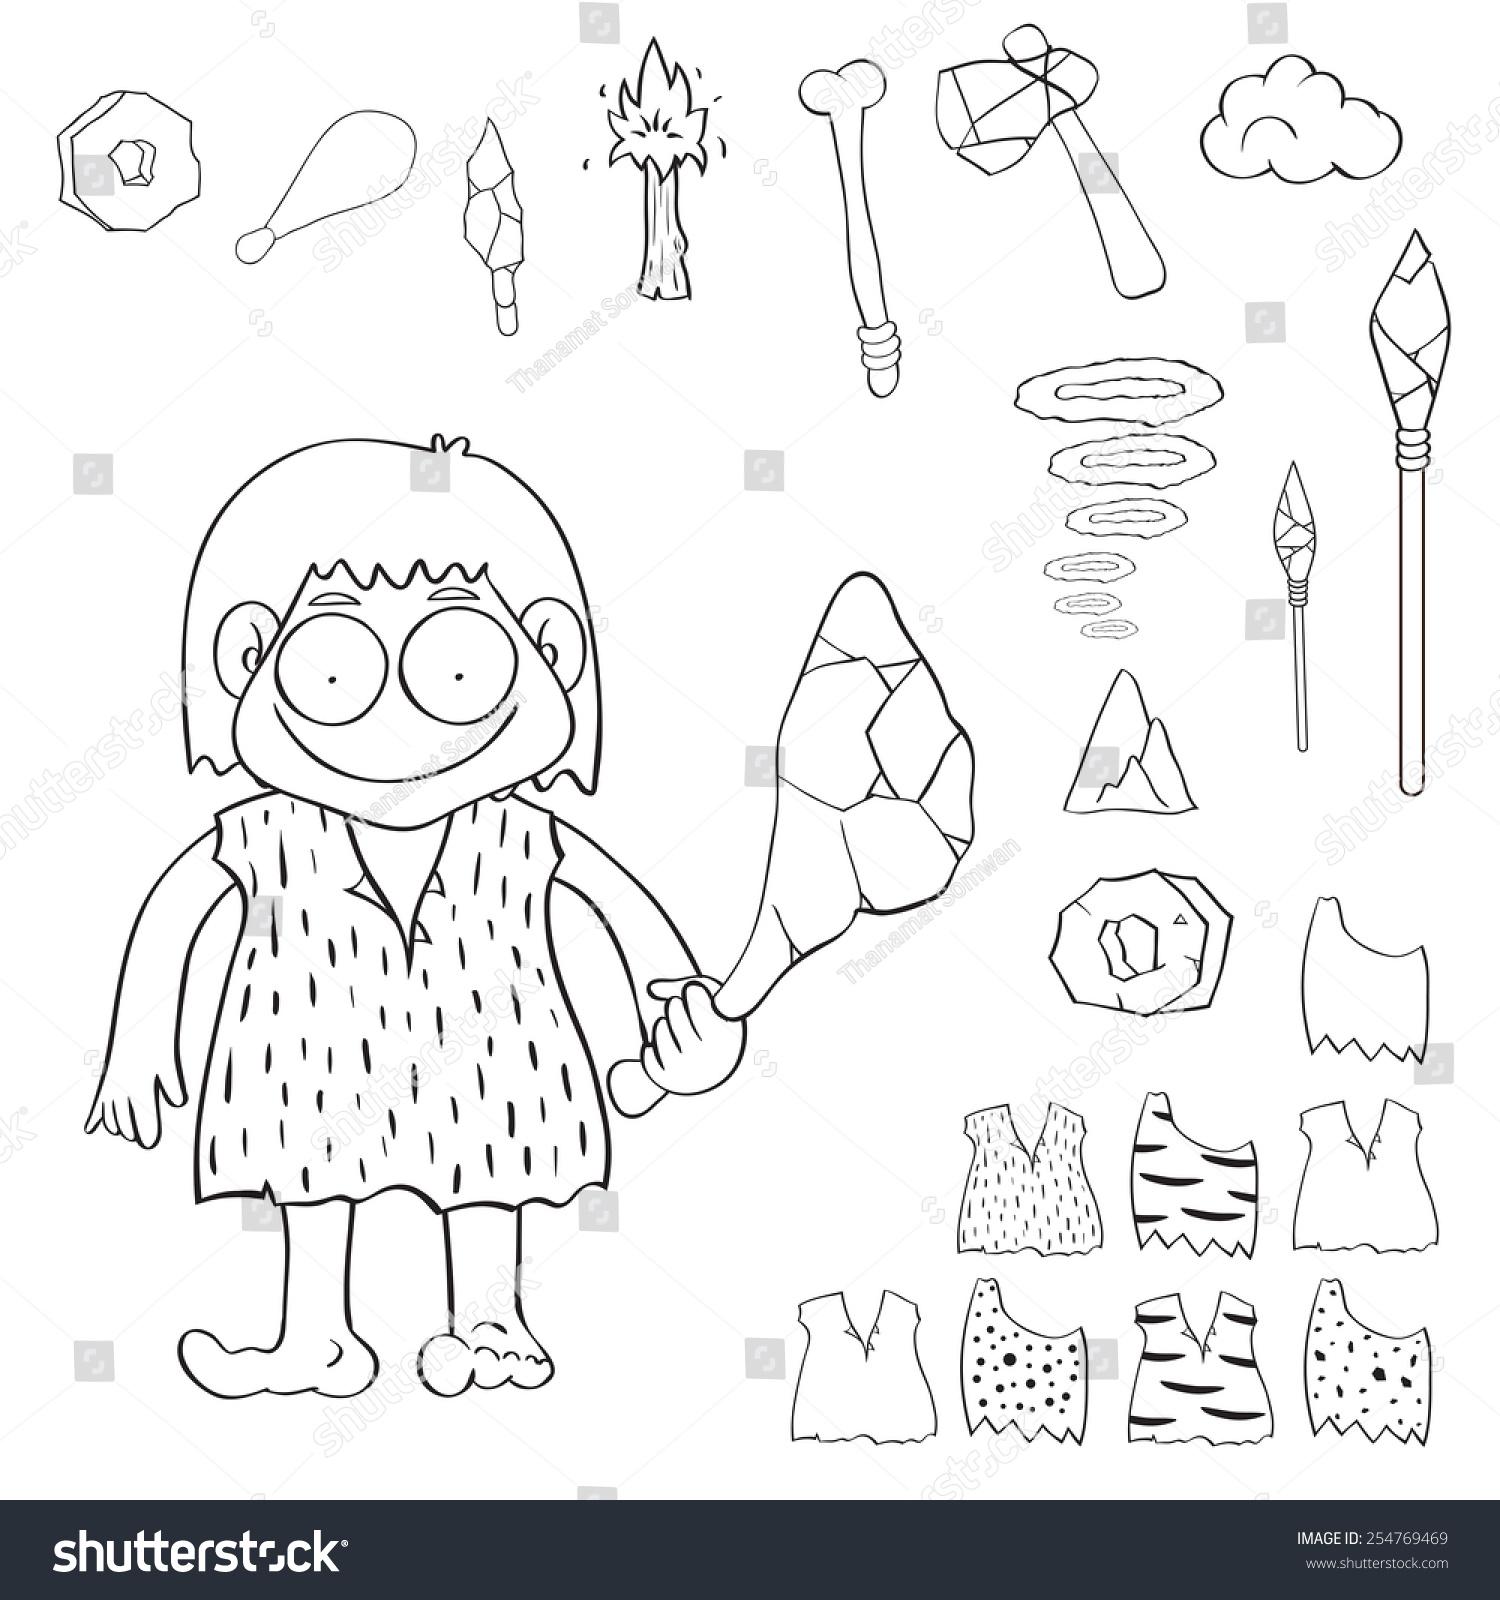 Stone Age People Cartoon Vector Illustration Stock Vector